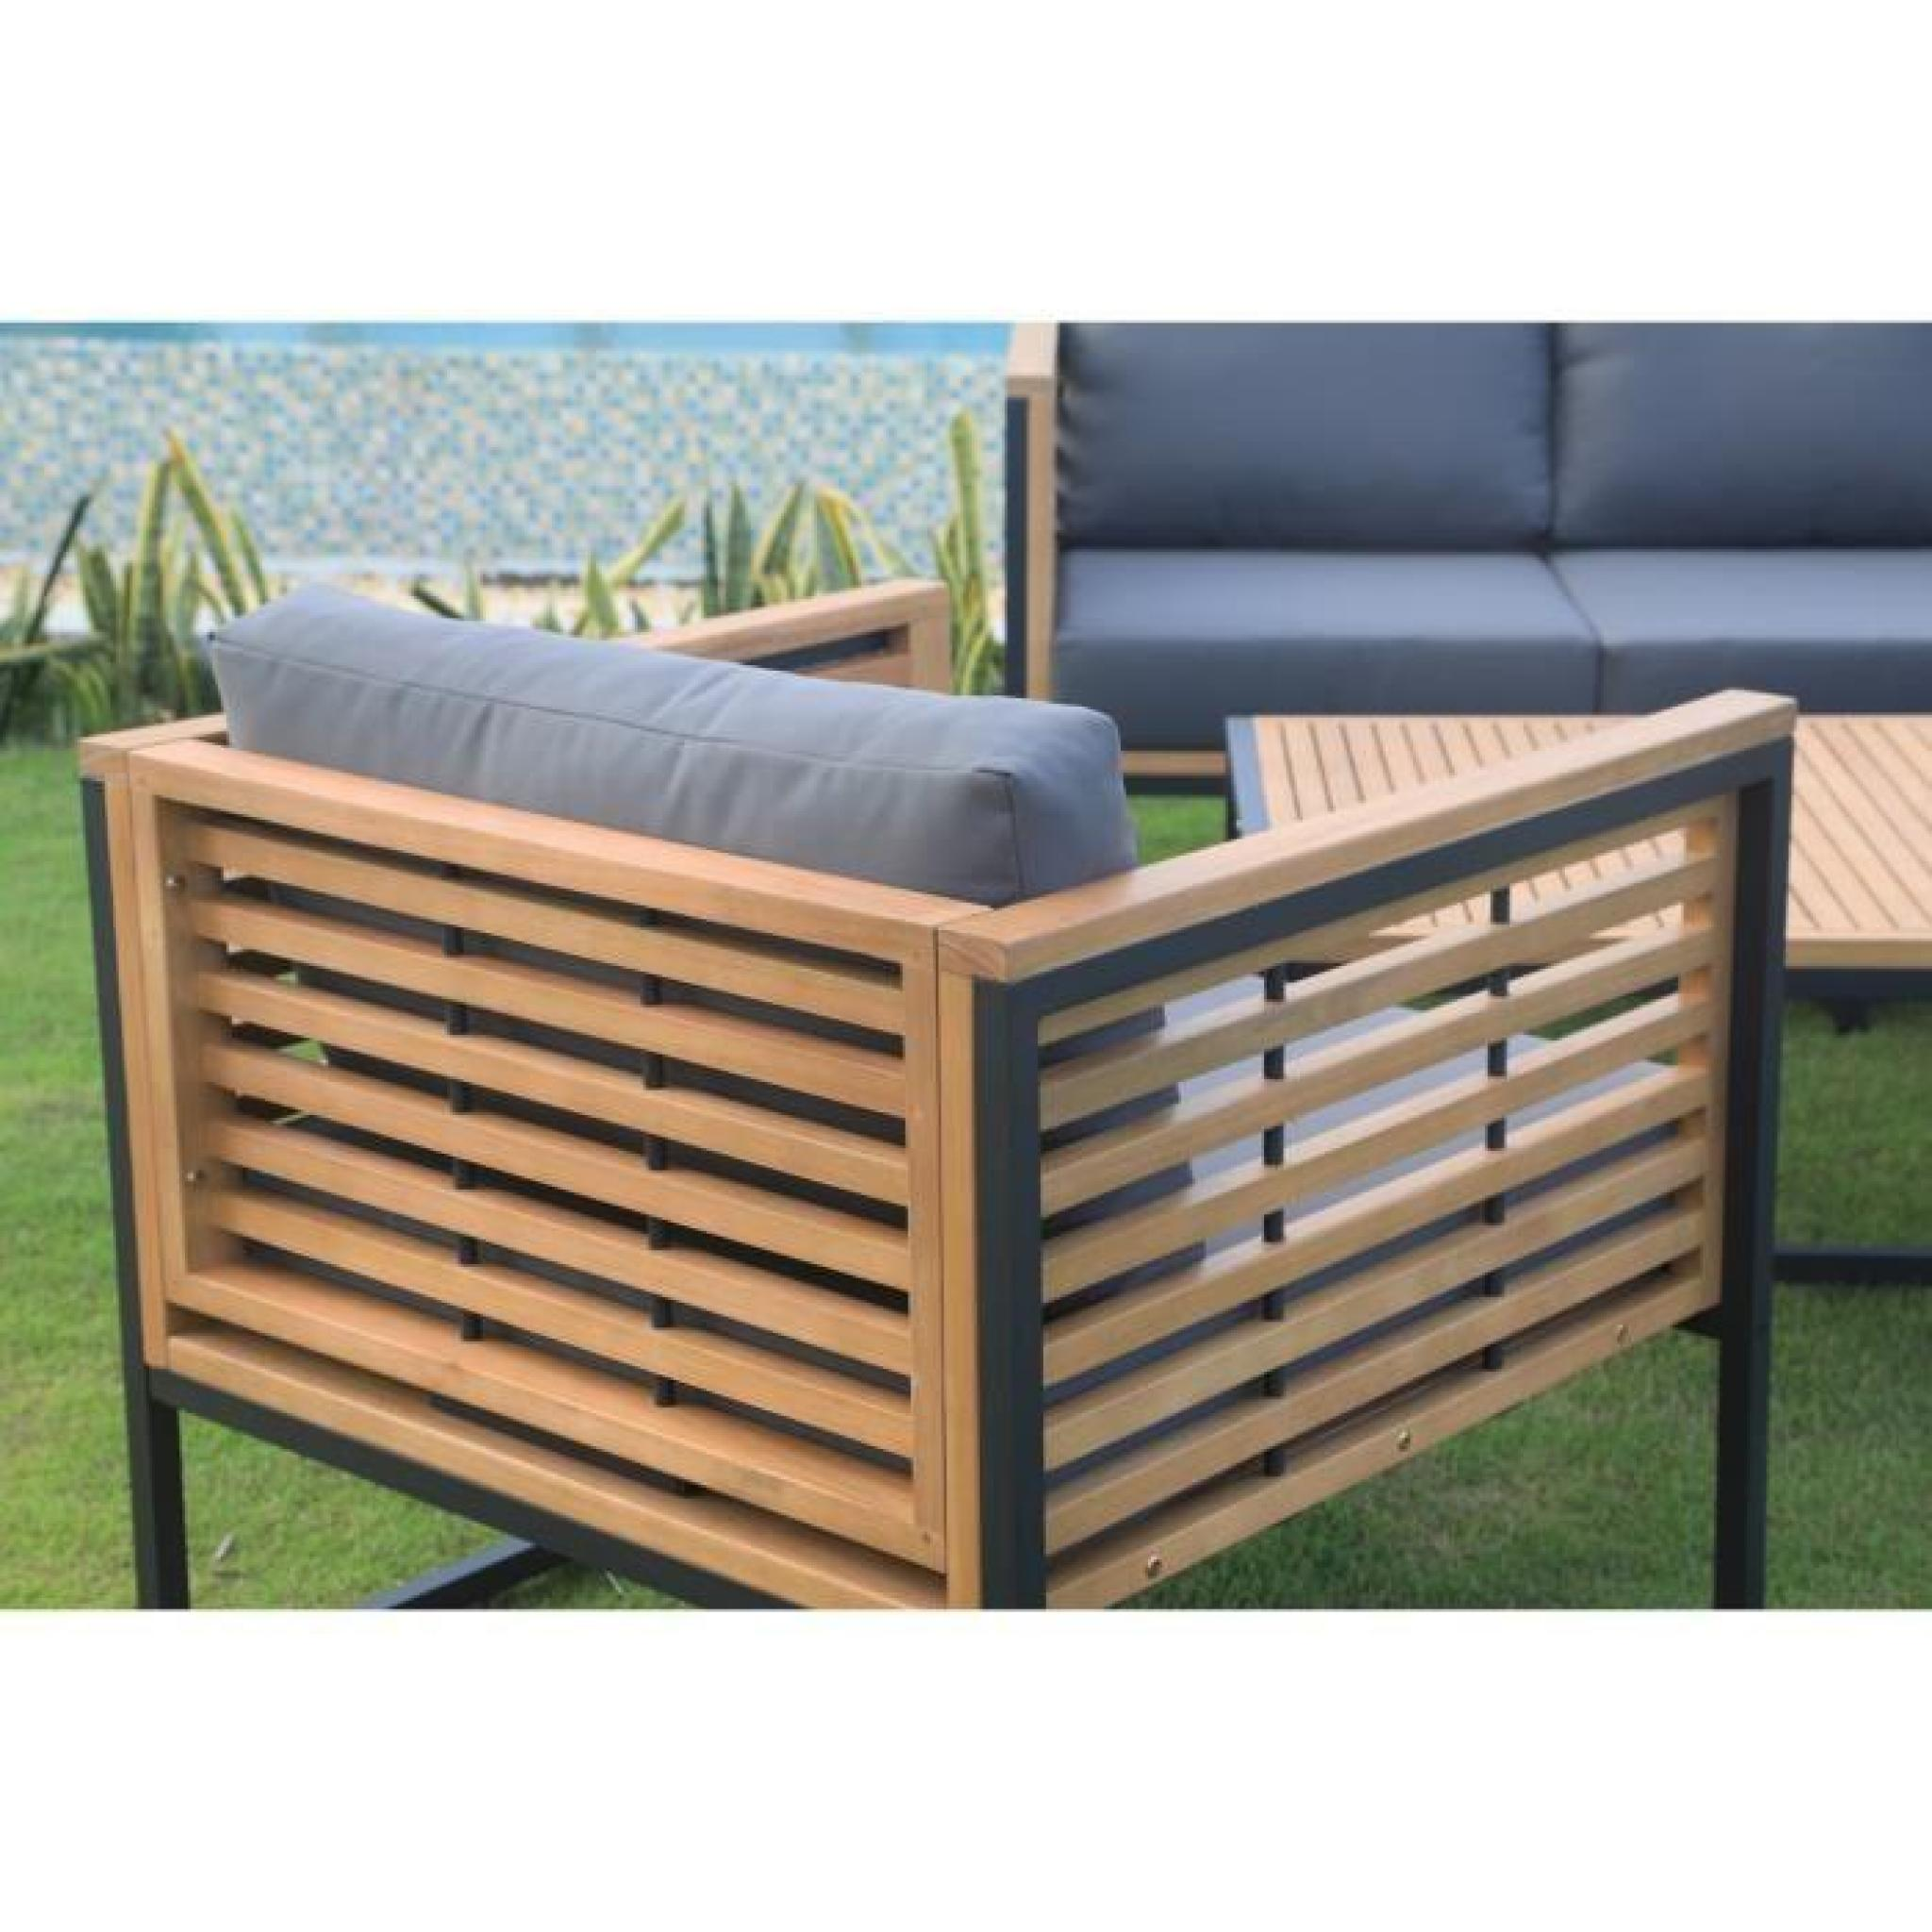 Salon de jardin 5 places en eucalyptus FSC et aluminium